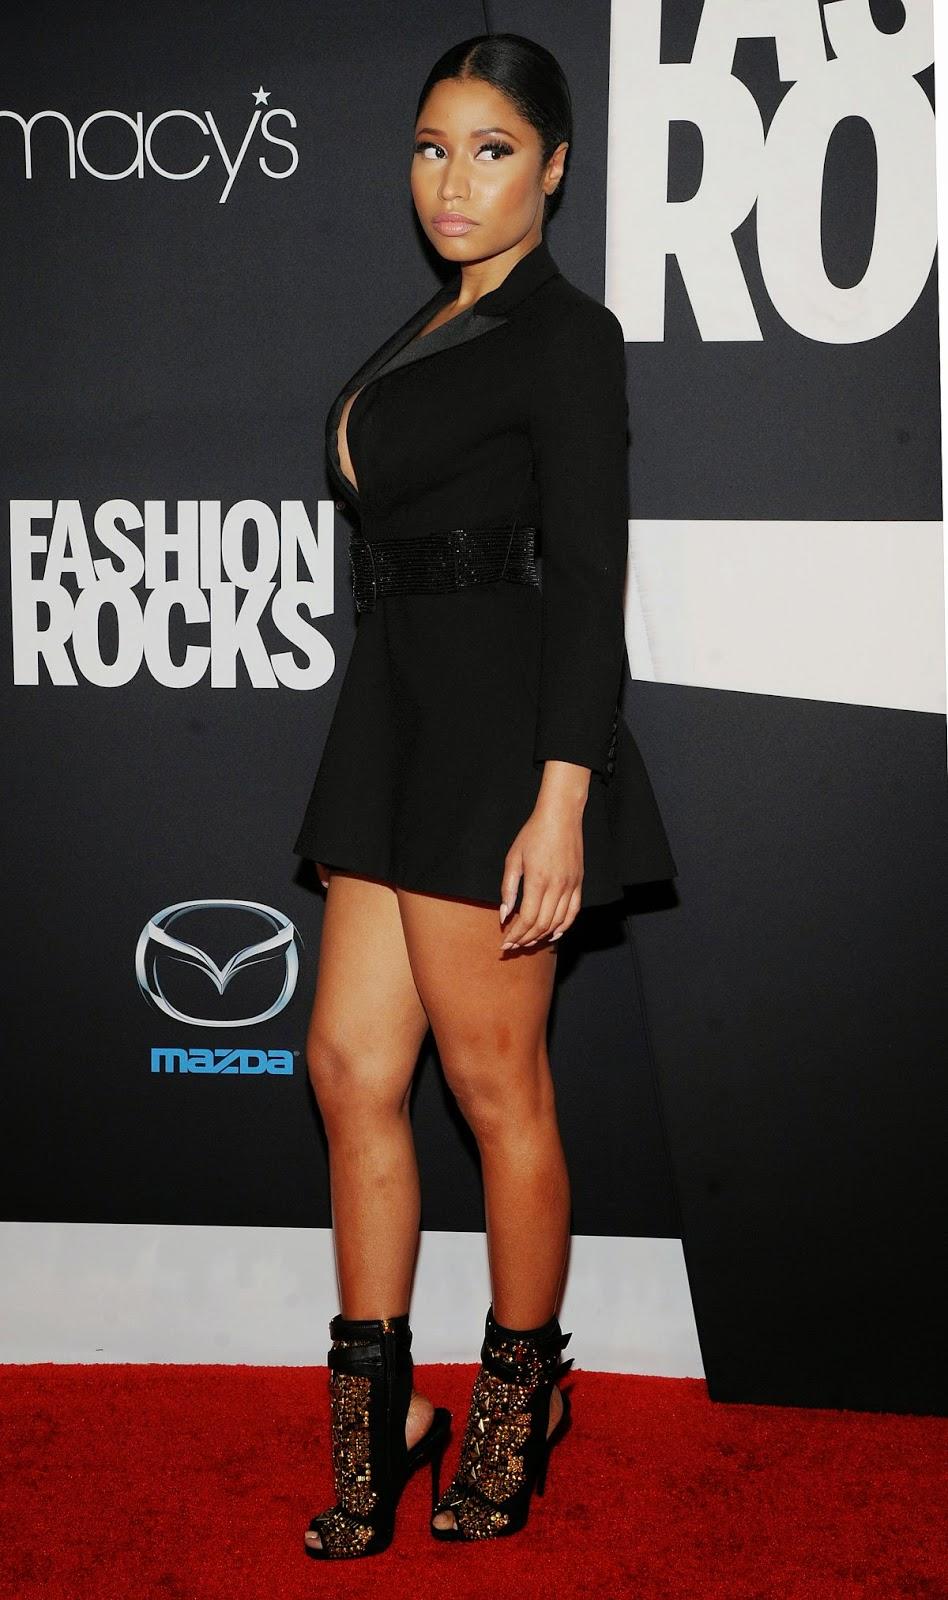 Nicki Minaj Latest Fashion Rock 2014 Popular Actress